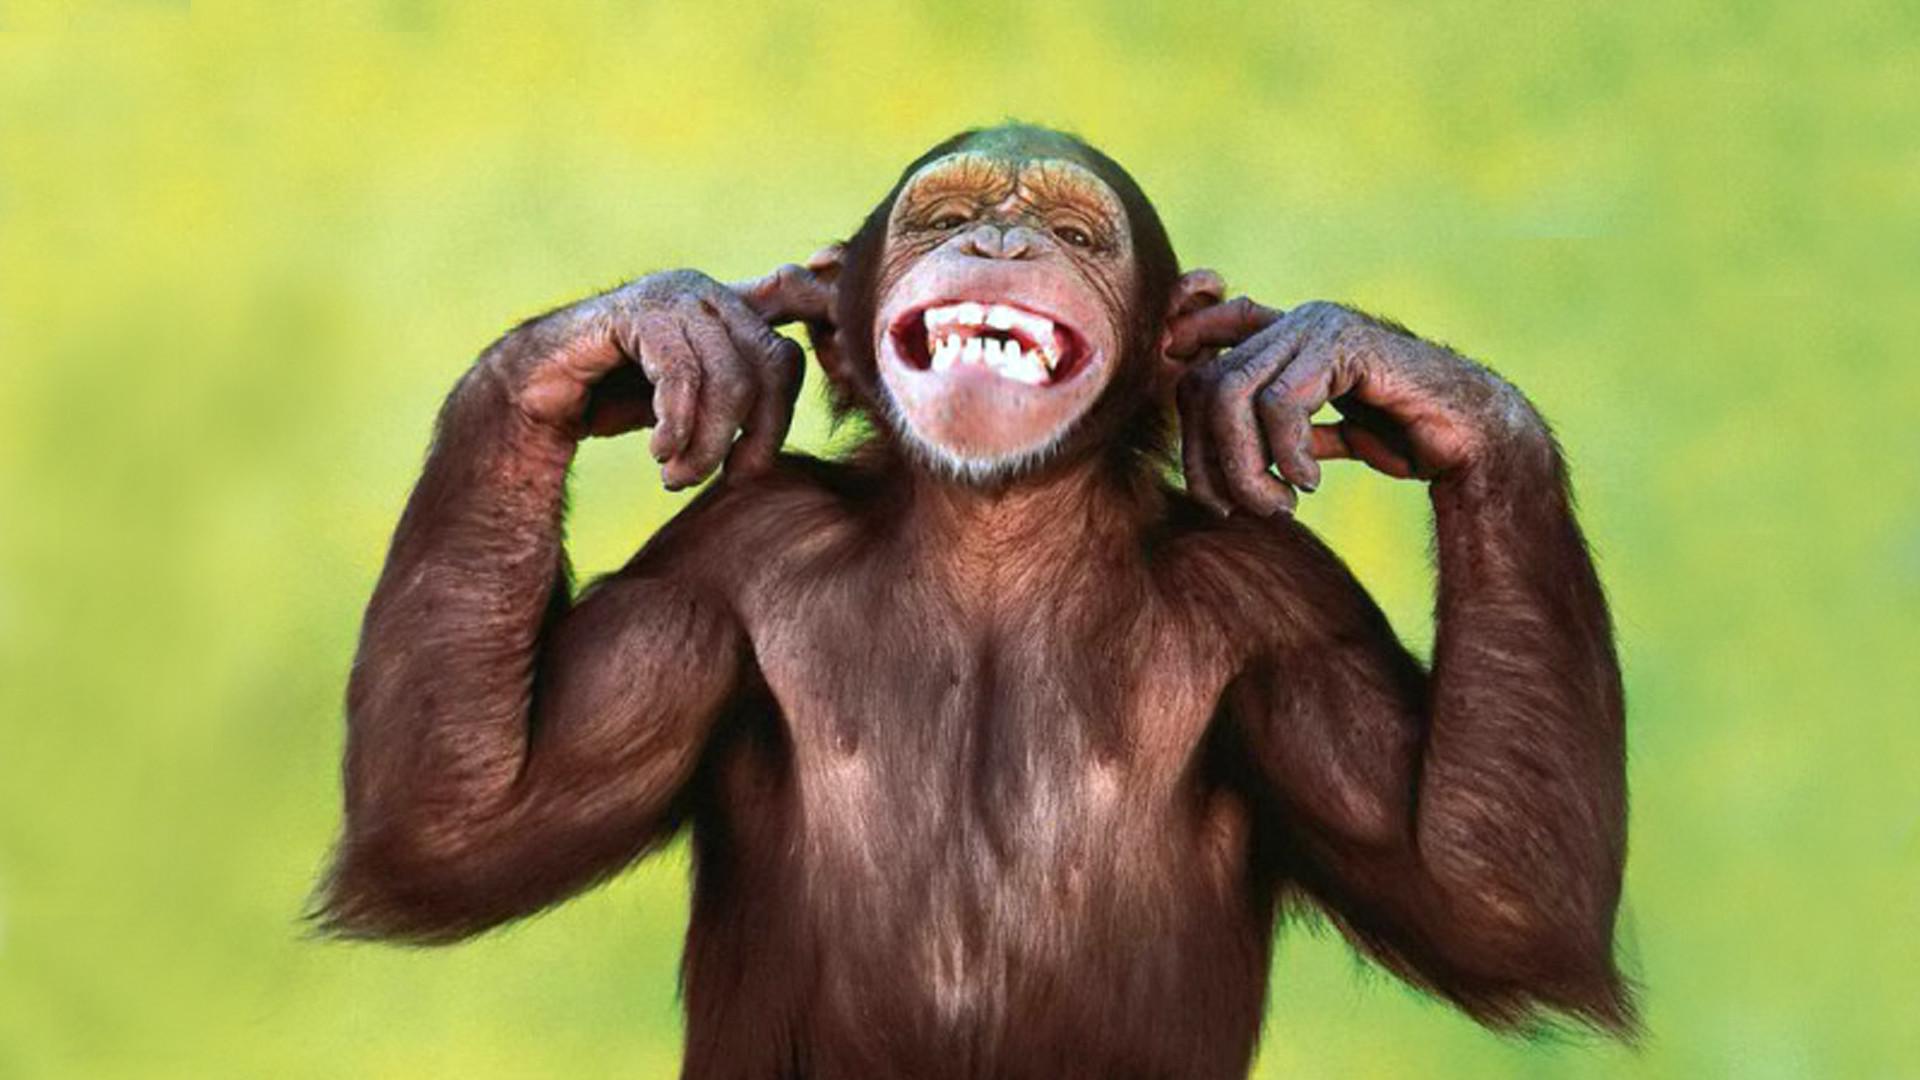 Funny Monkey – Free Choice Wallpaper : Free Choice Wallpaper